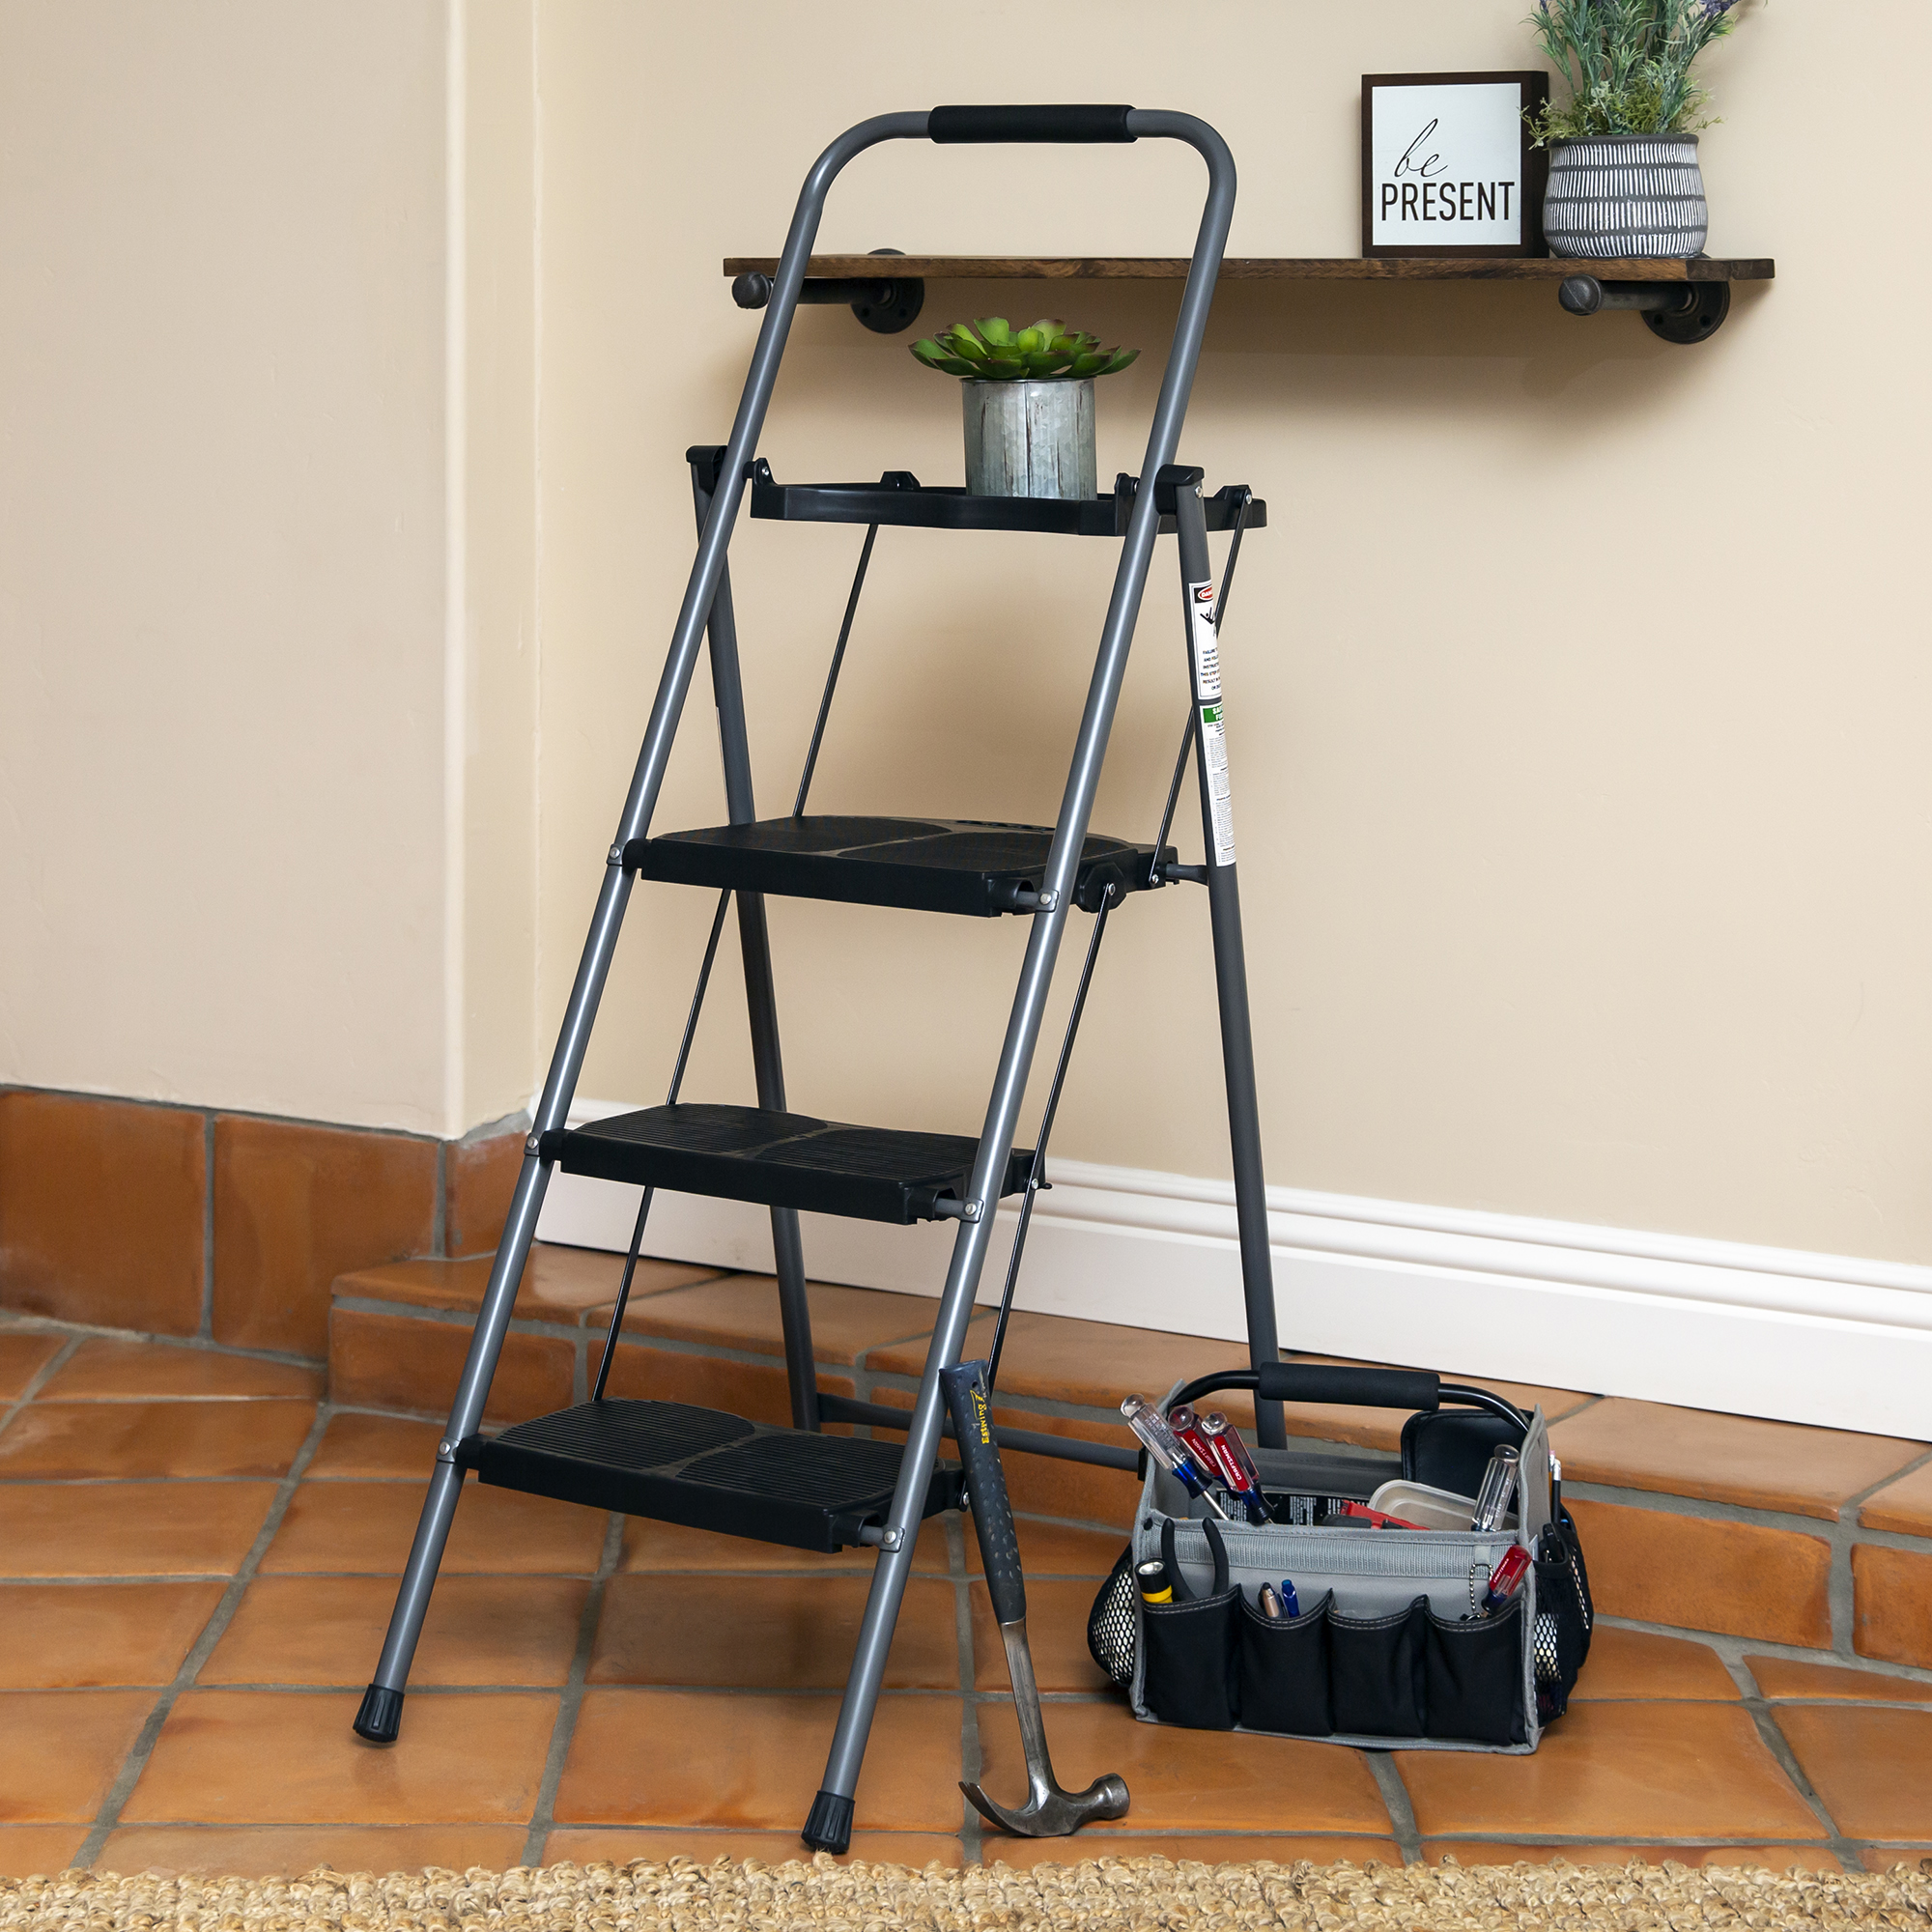 Bcp Folding Steel 3 Step Ladder W Hand Grip Wide Steps